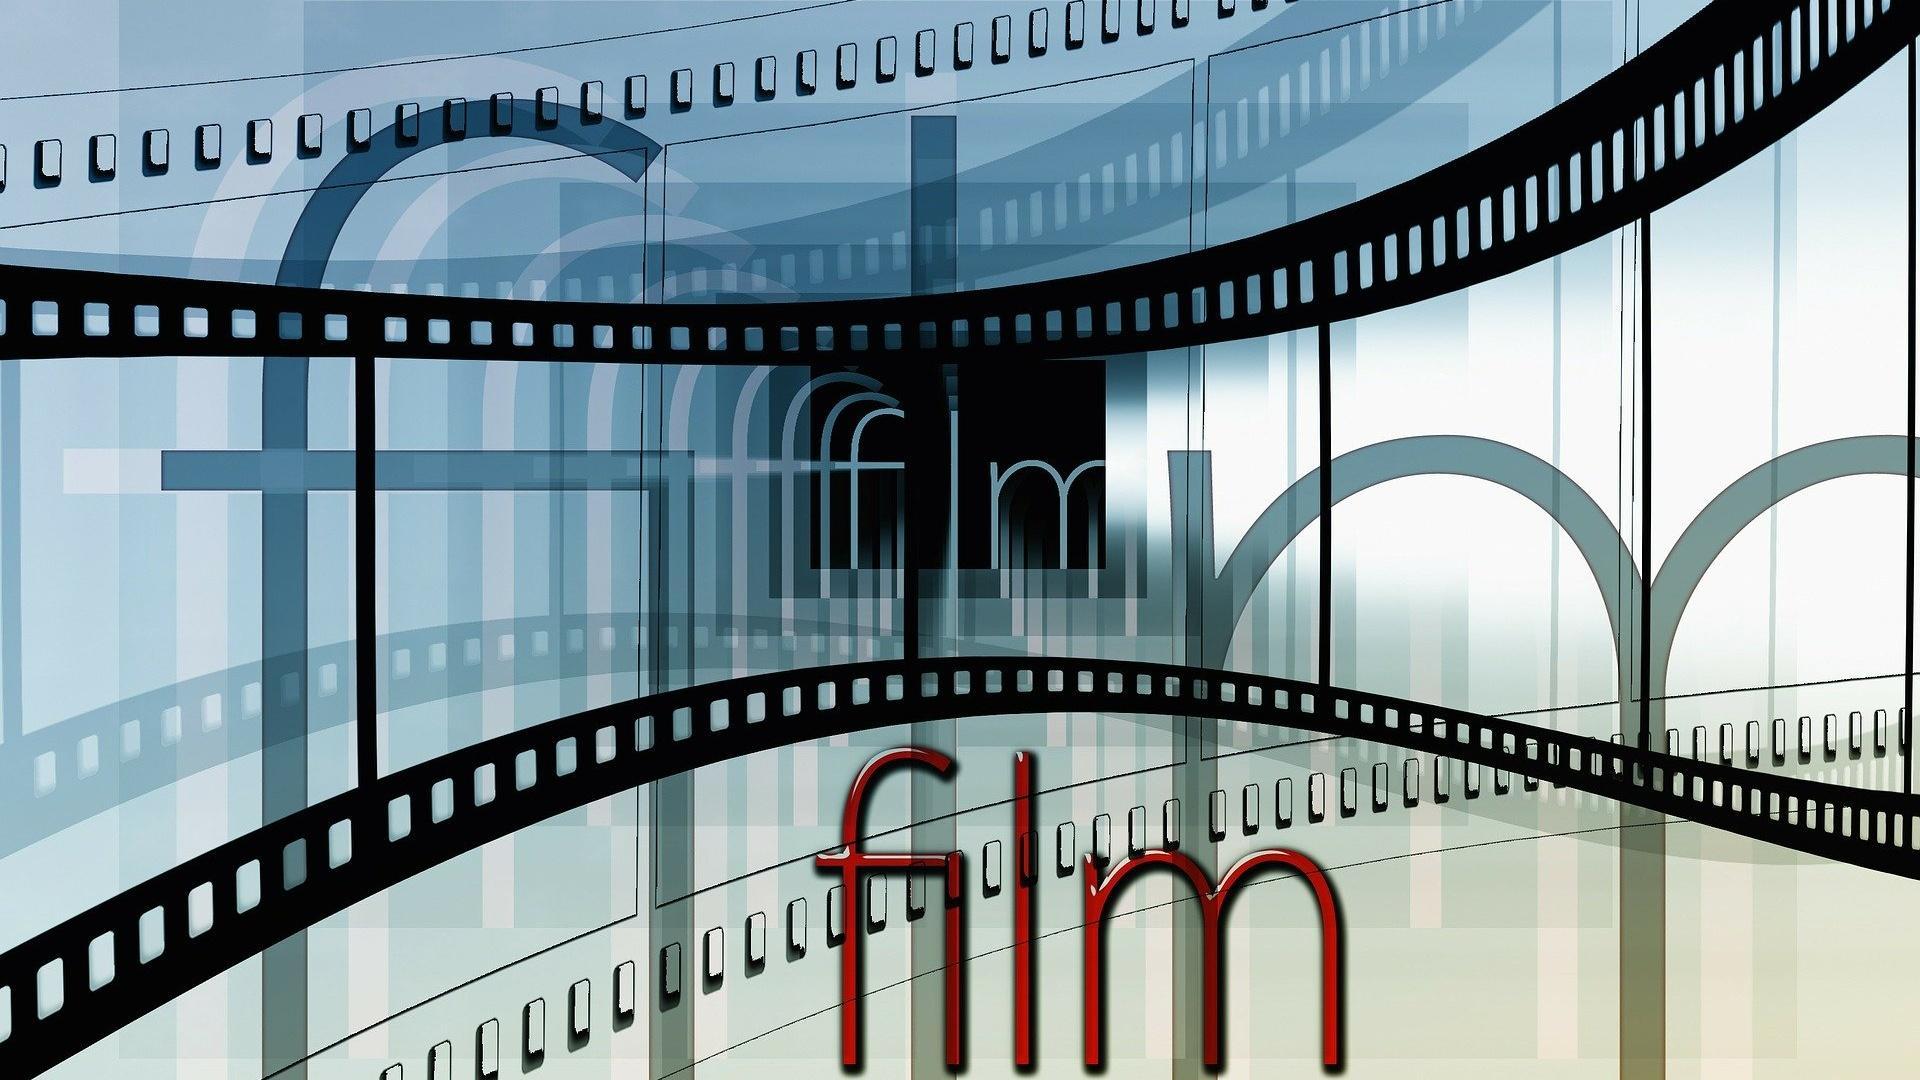 Amazon Prime Video: Filme und Serien downloaden - so geht's